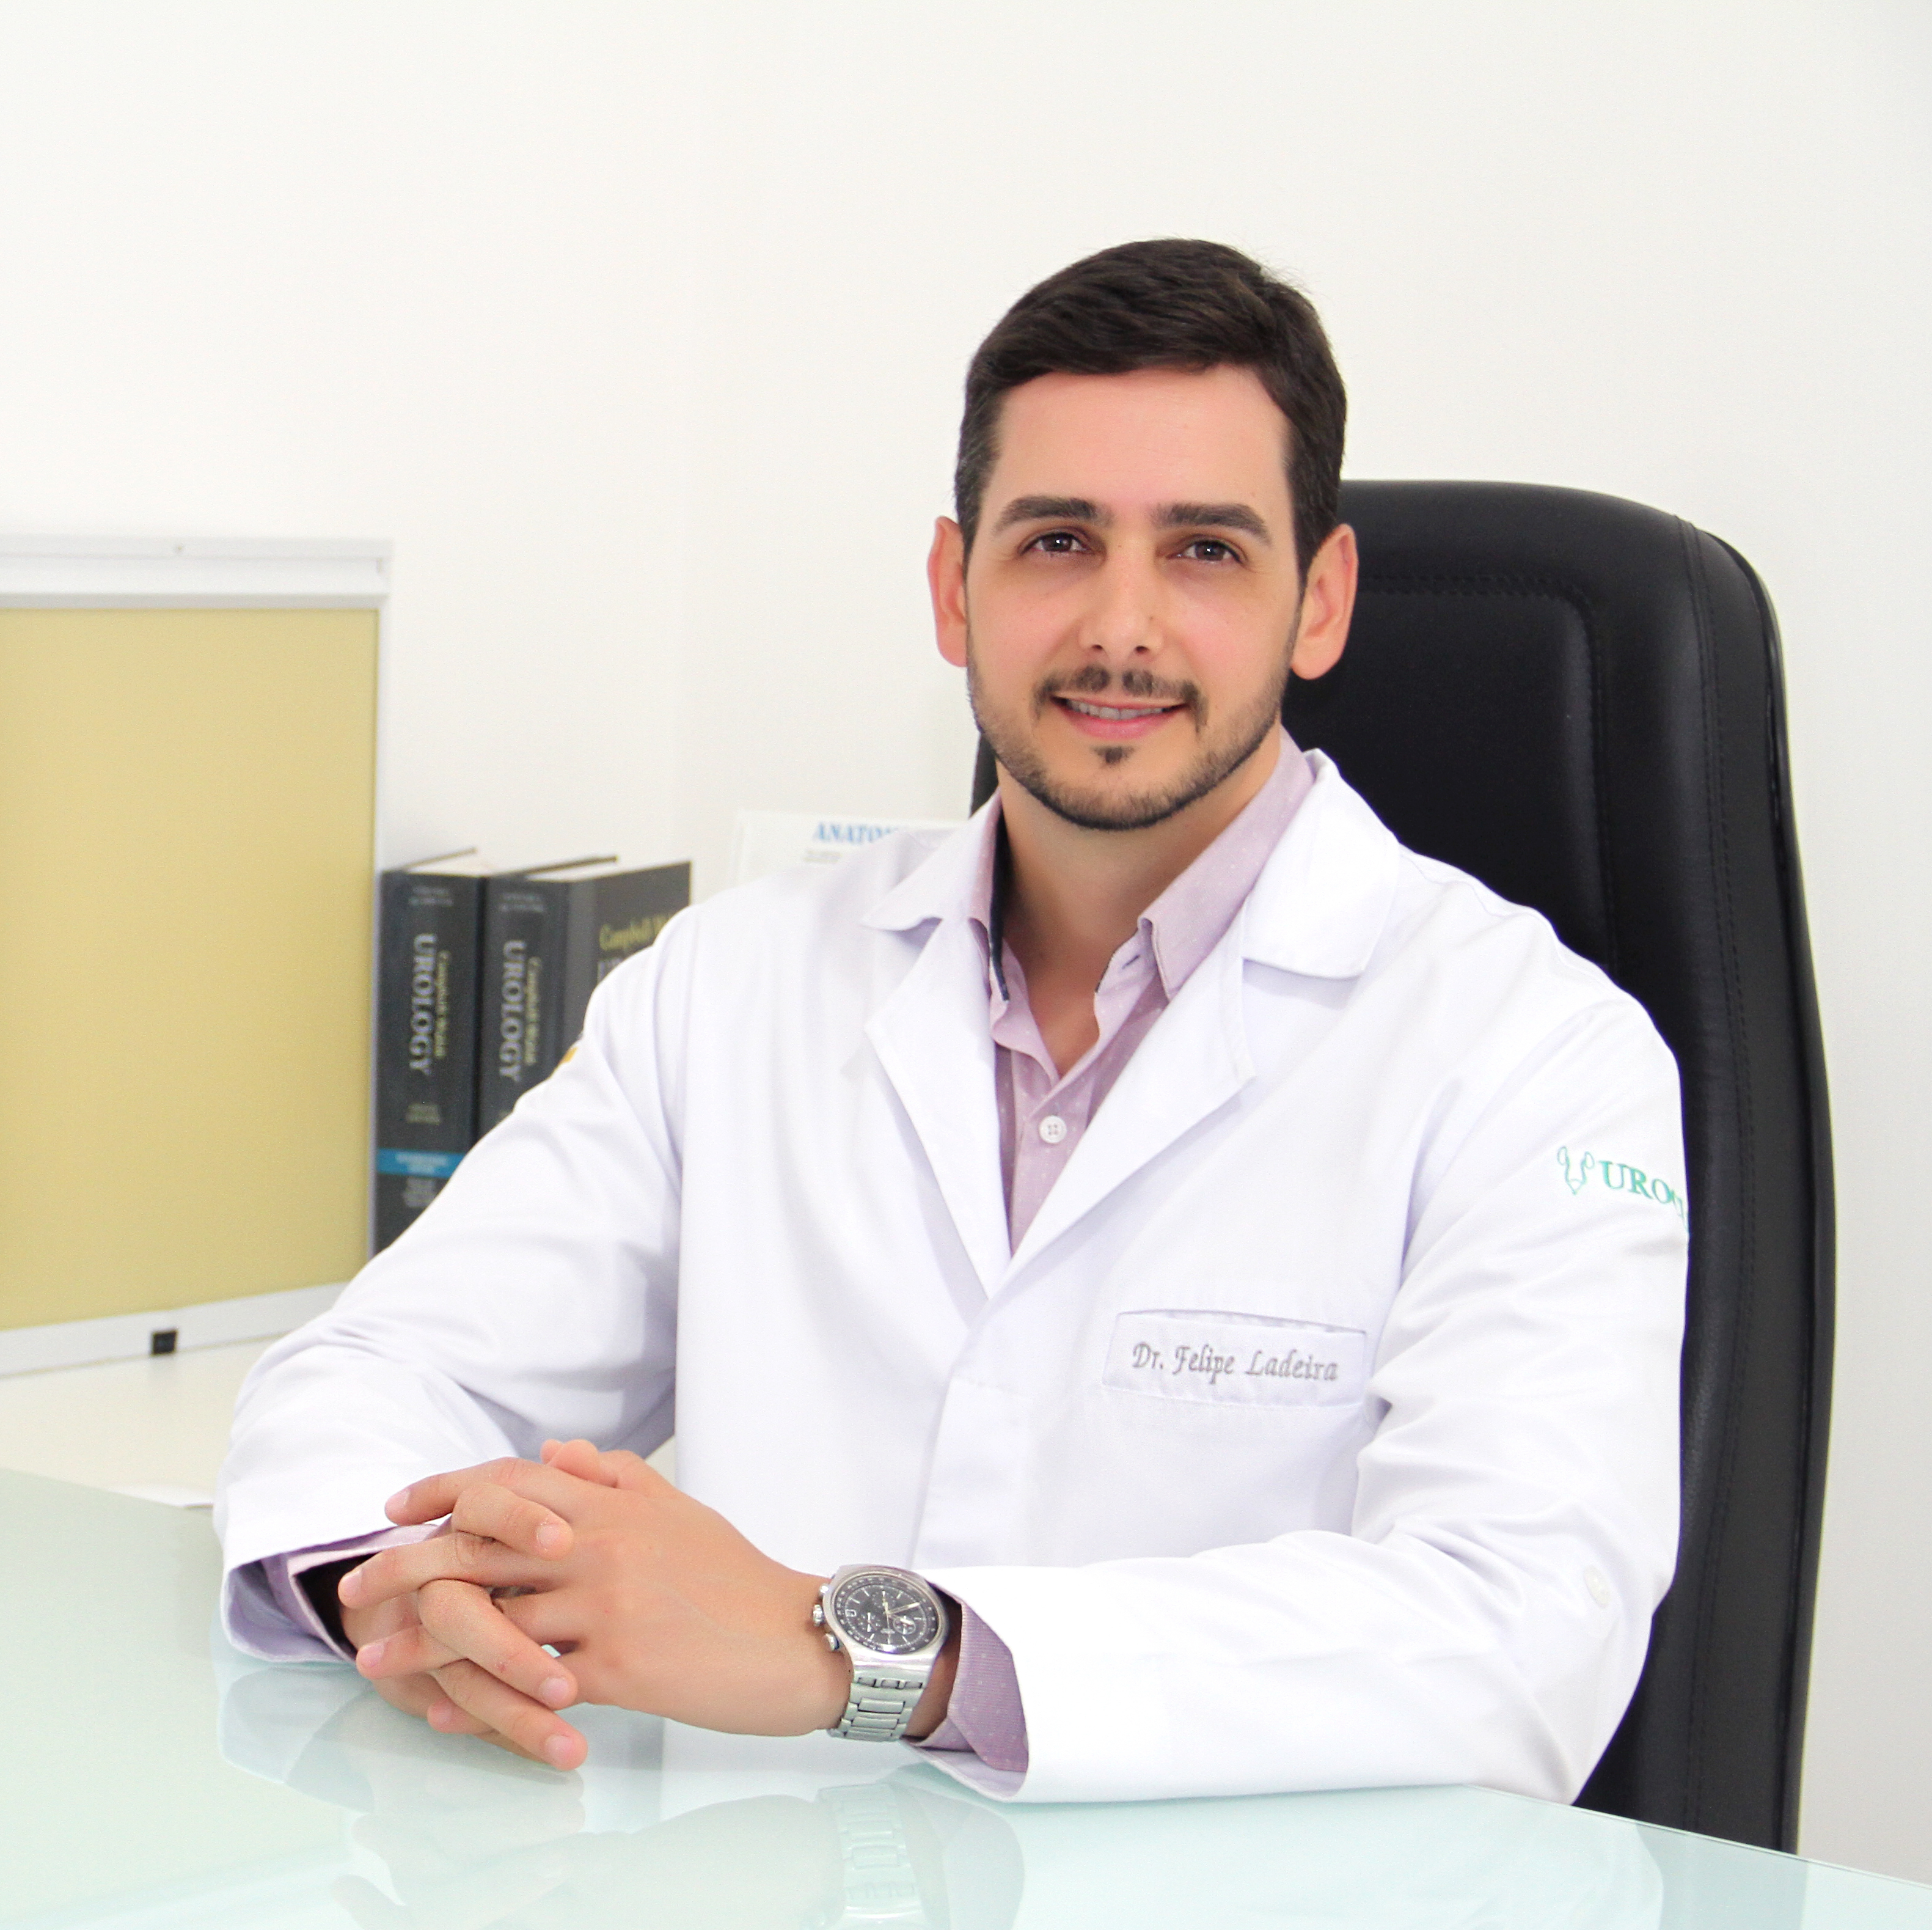 Filipe Lisbôa de Carli